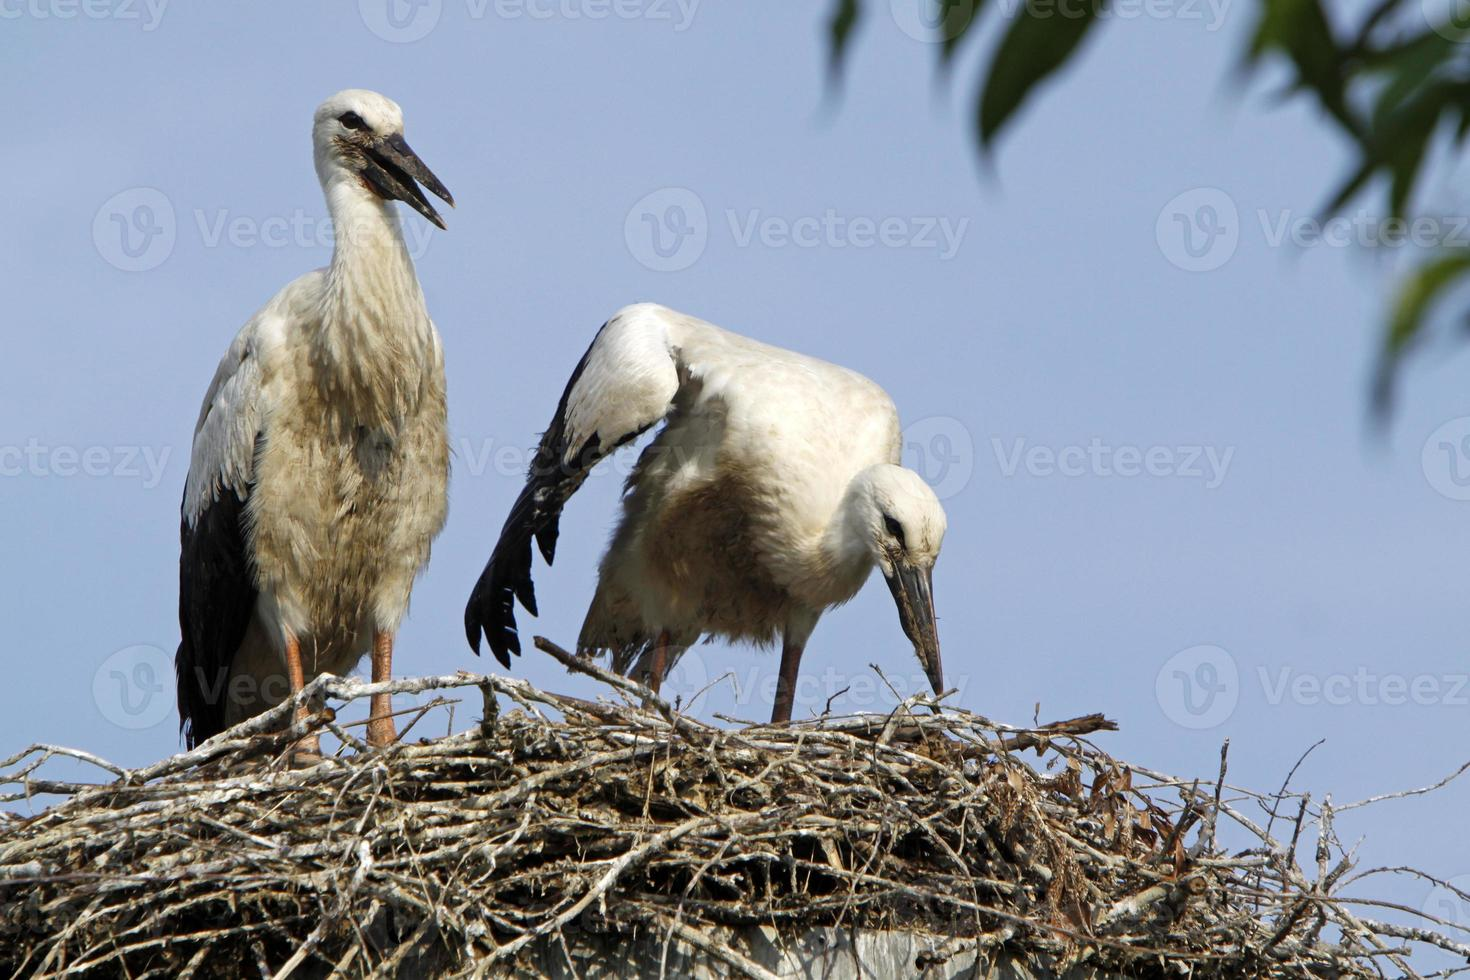 White Storks in their nest photo